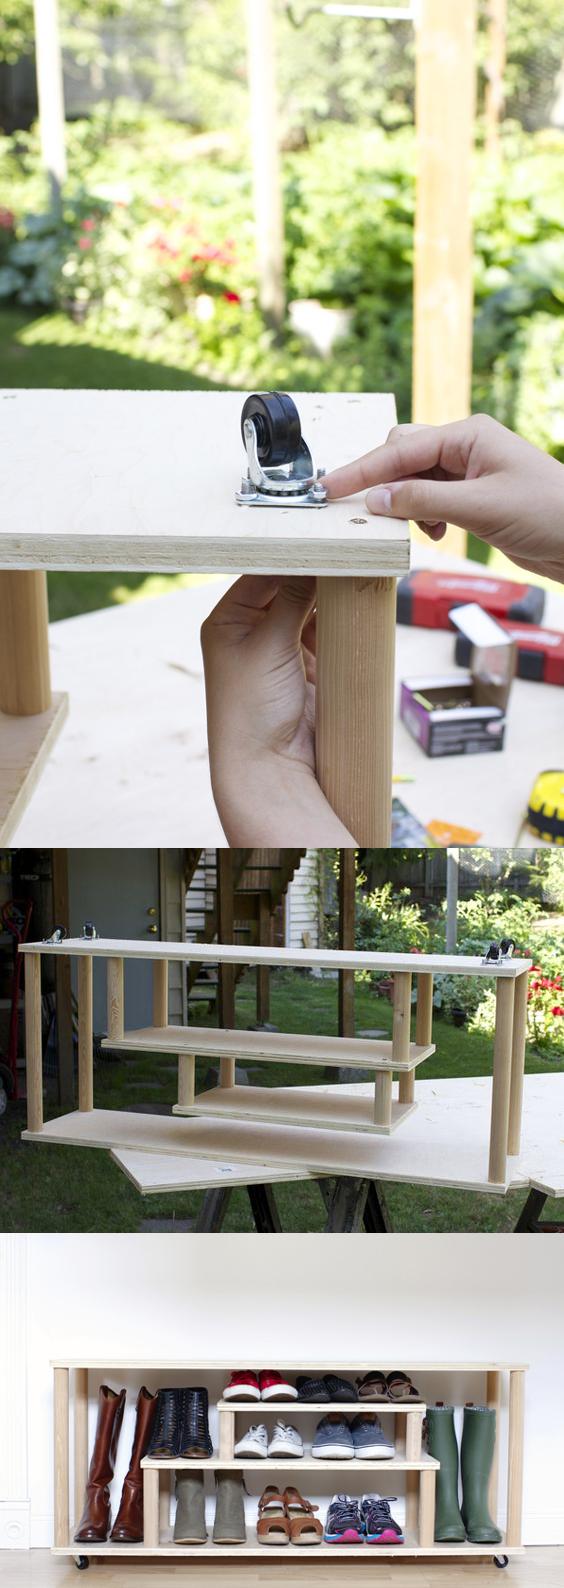 6 Movable Shoe Bench via simphome